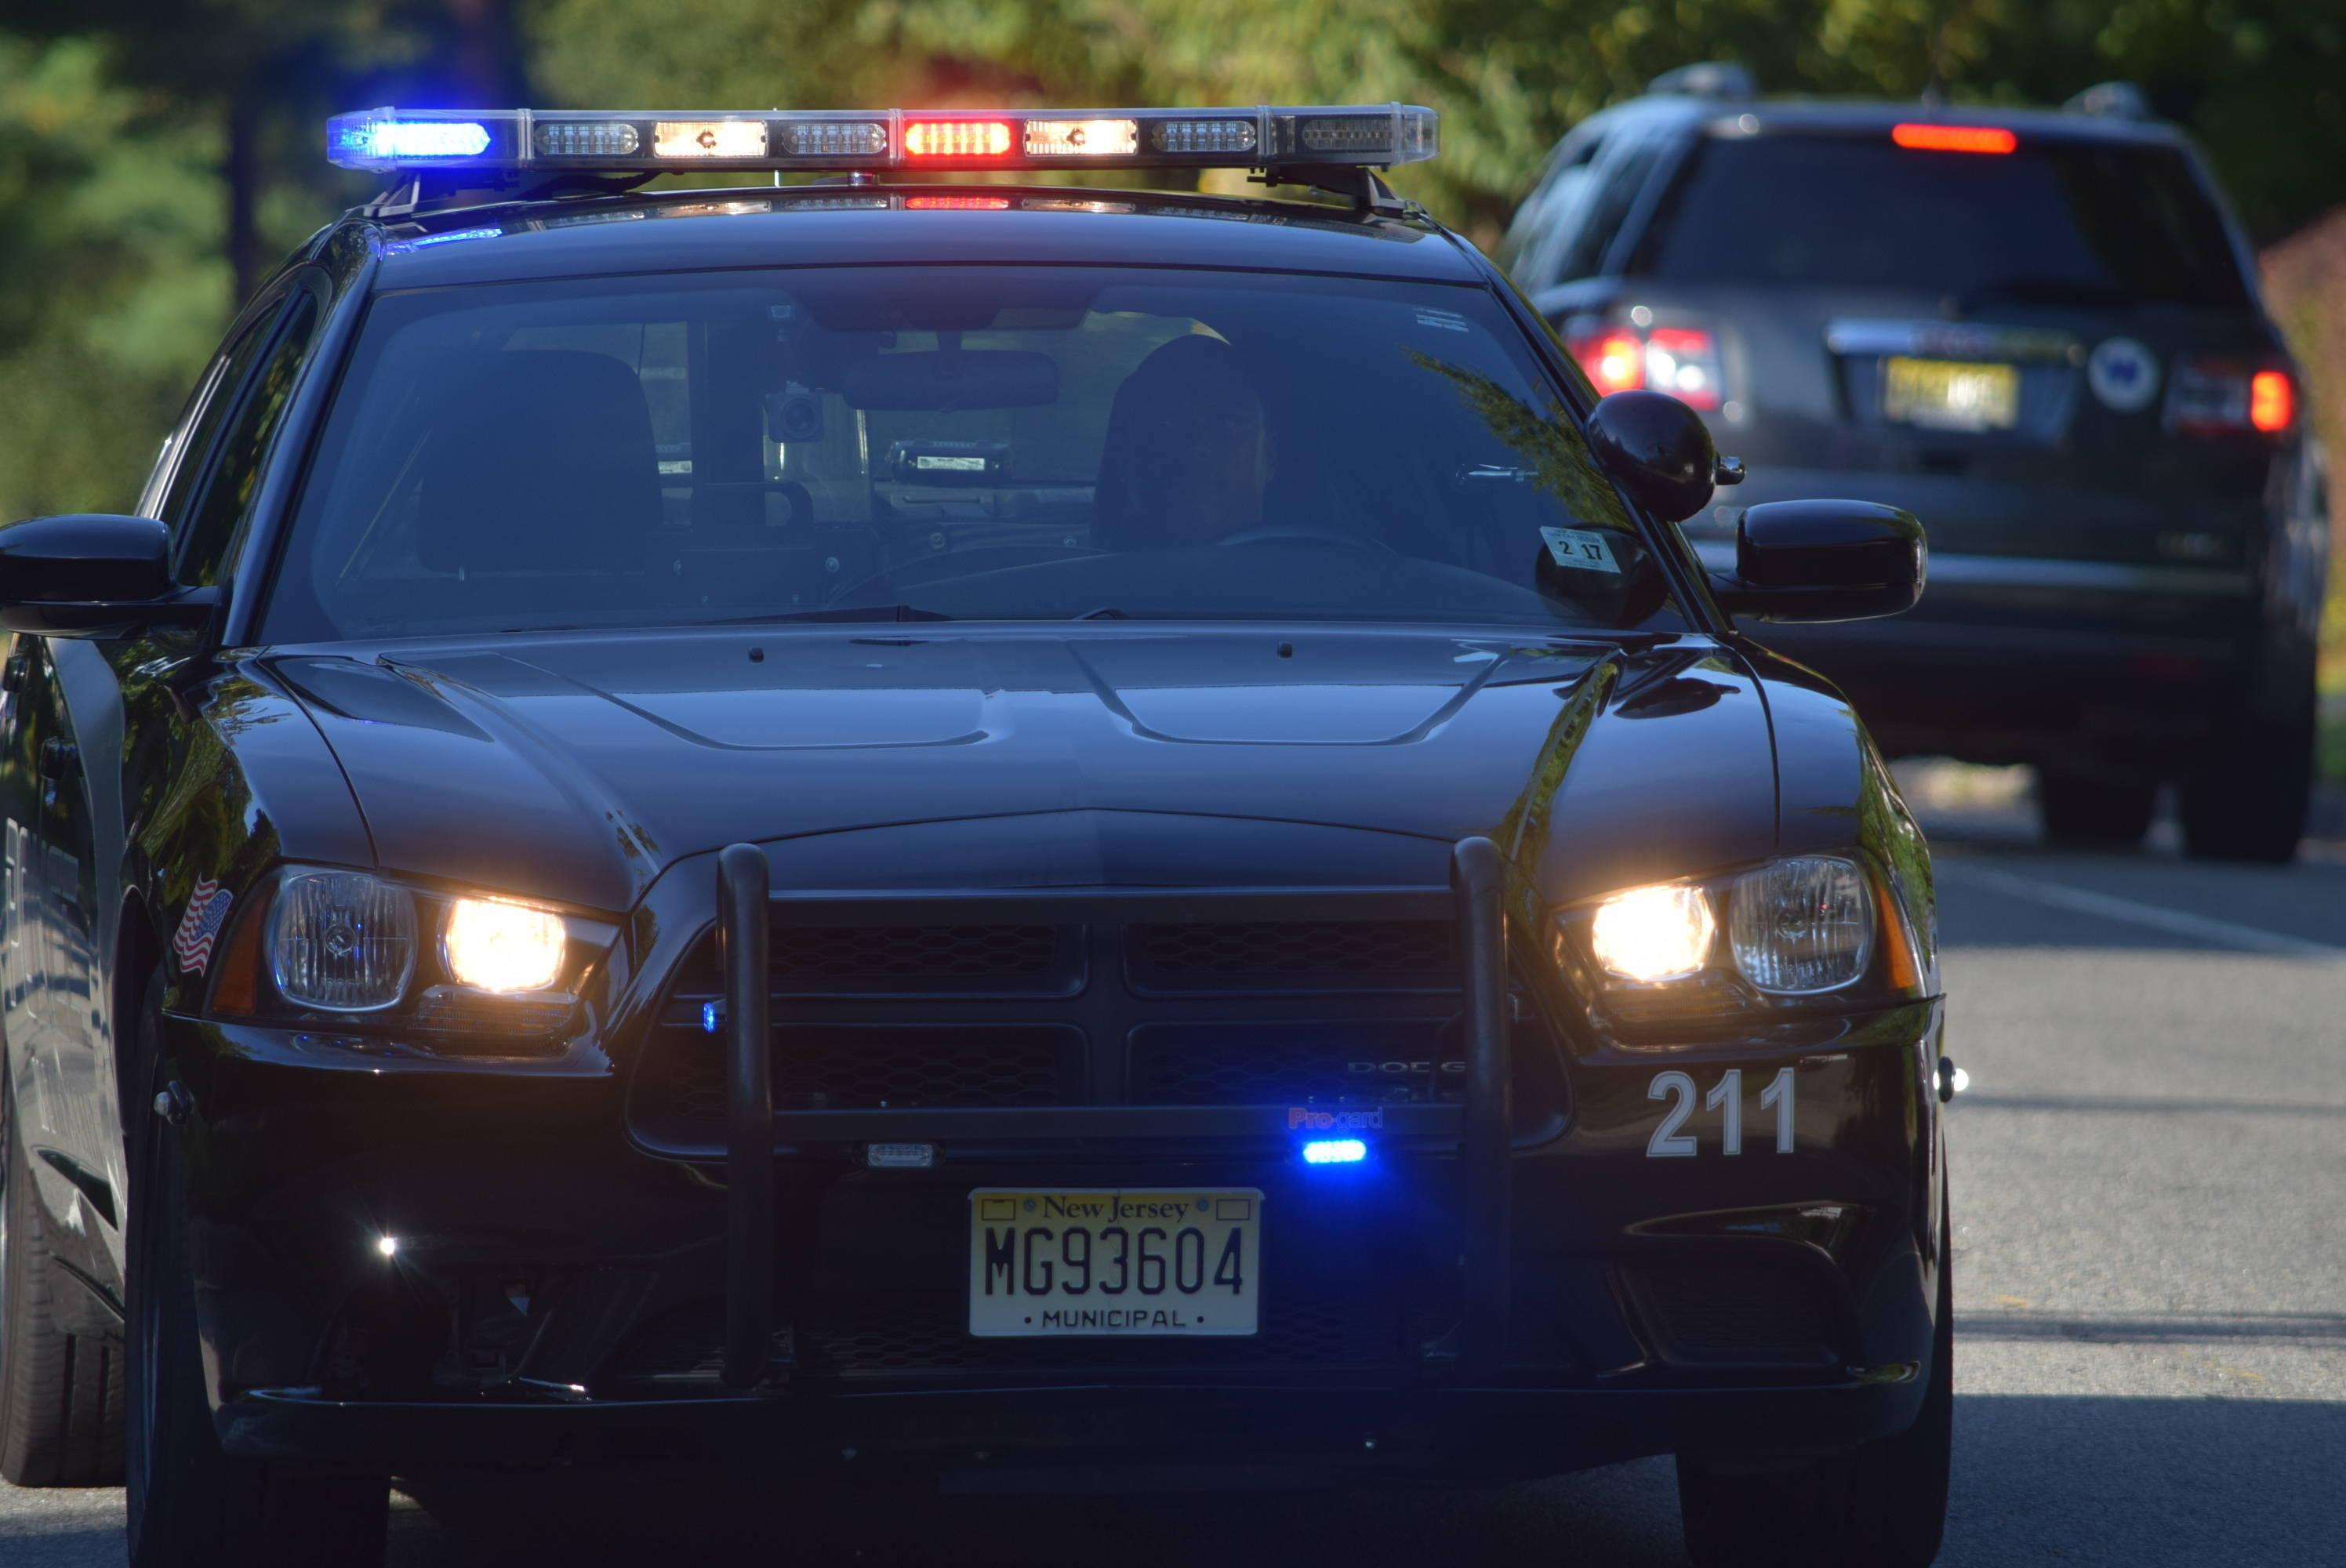 cf1a11f8805b6d0b856e_3028164c2f13b76bb4ff_police_car.JPG